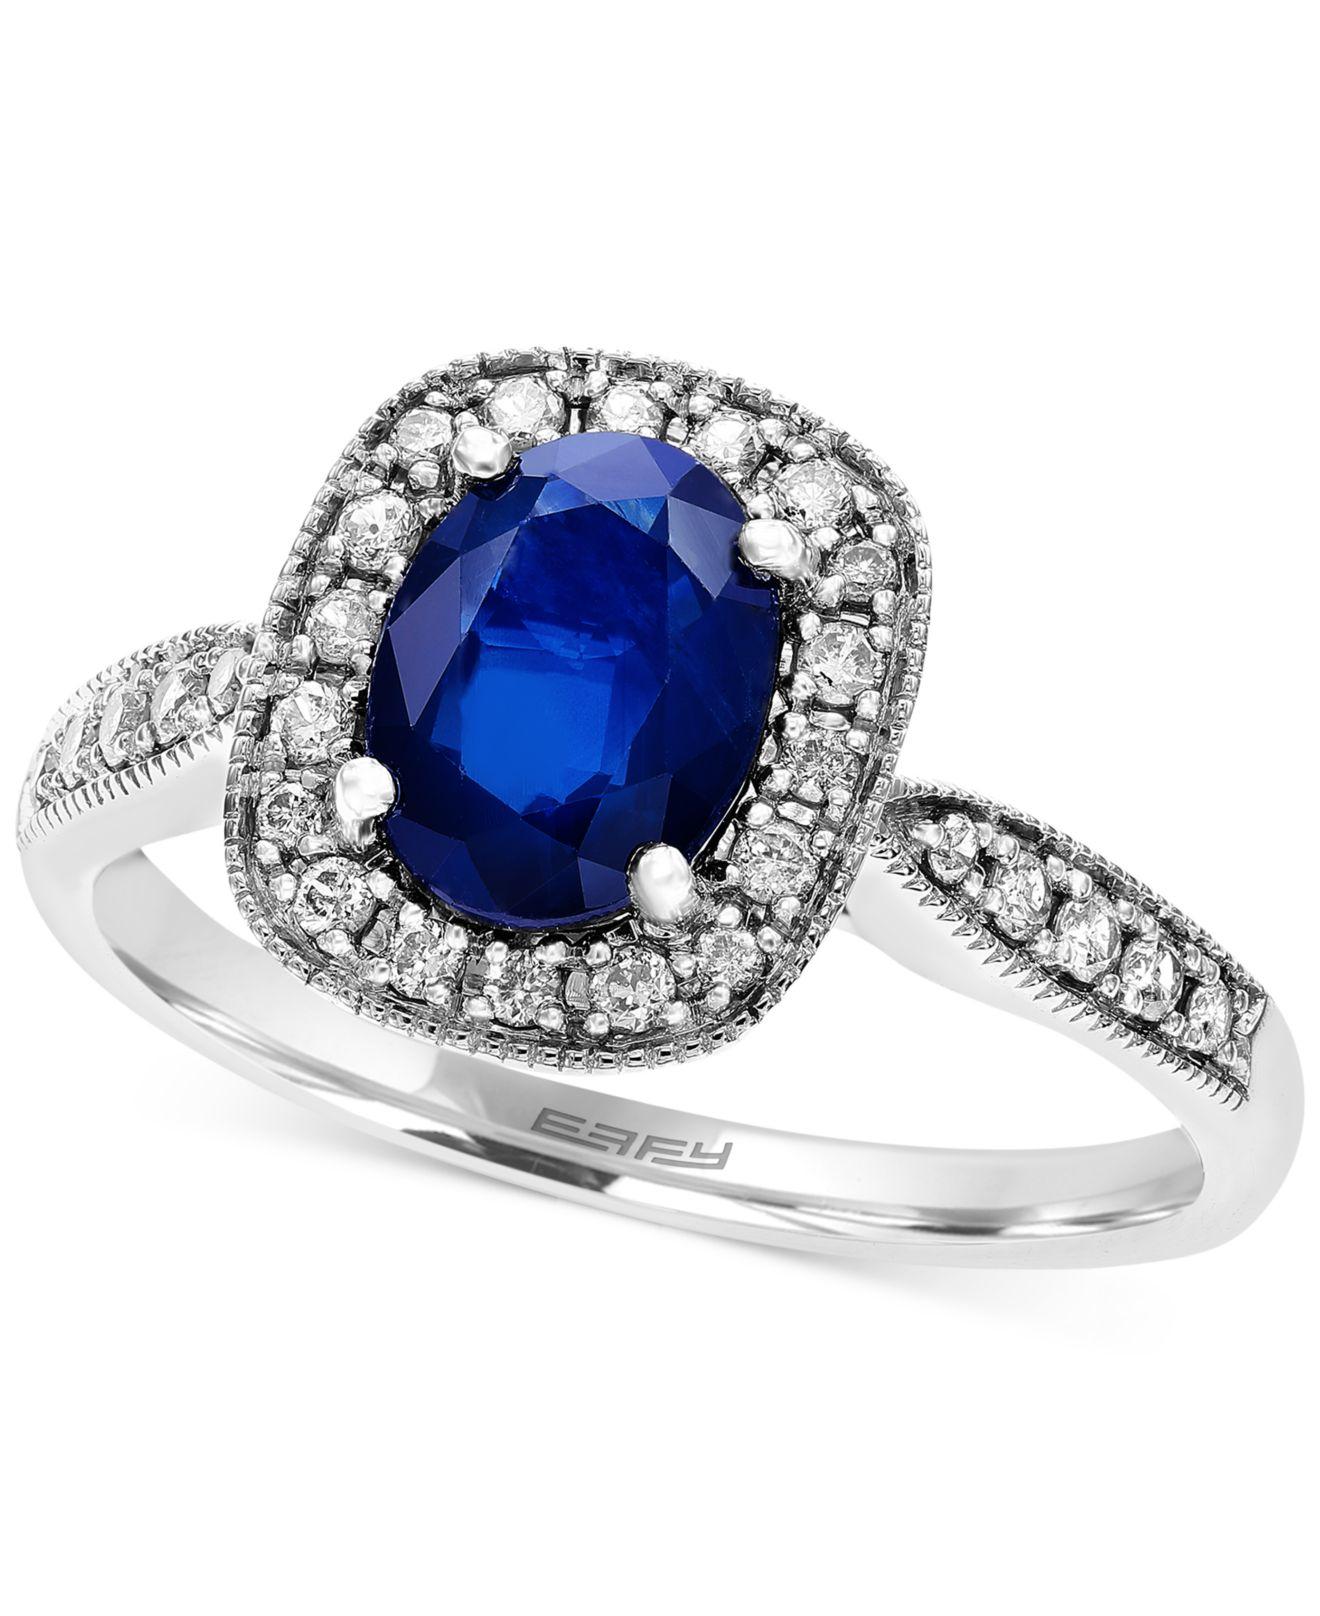 Effy Jewelry Sapphire Rings